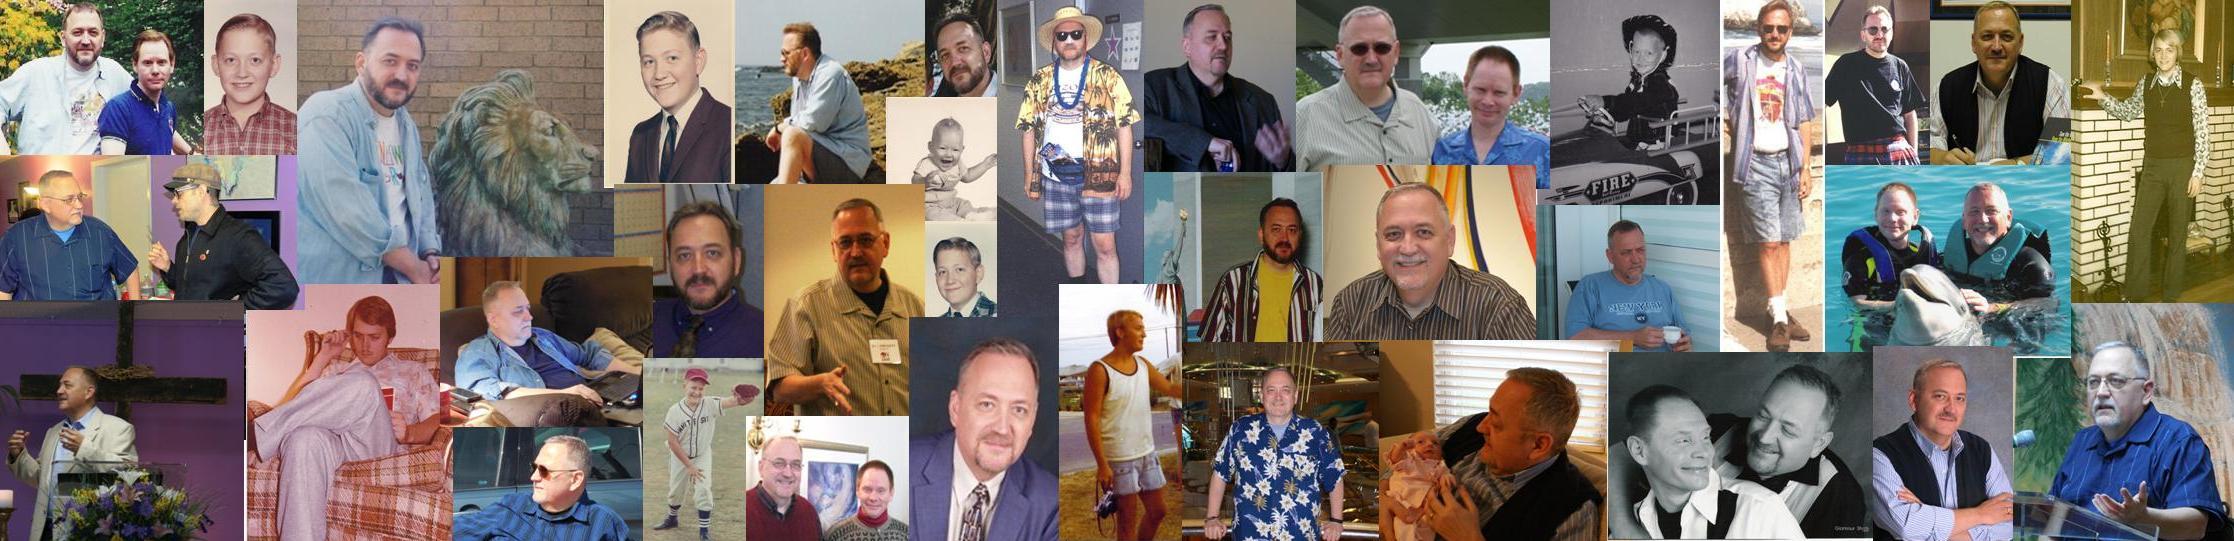 bill-prickett-collage.jpg